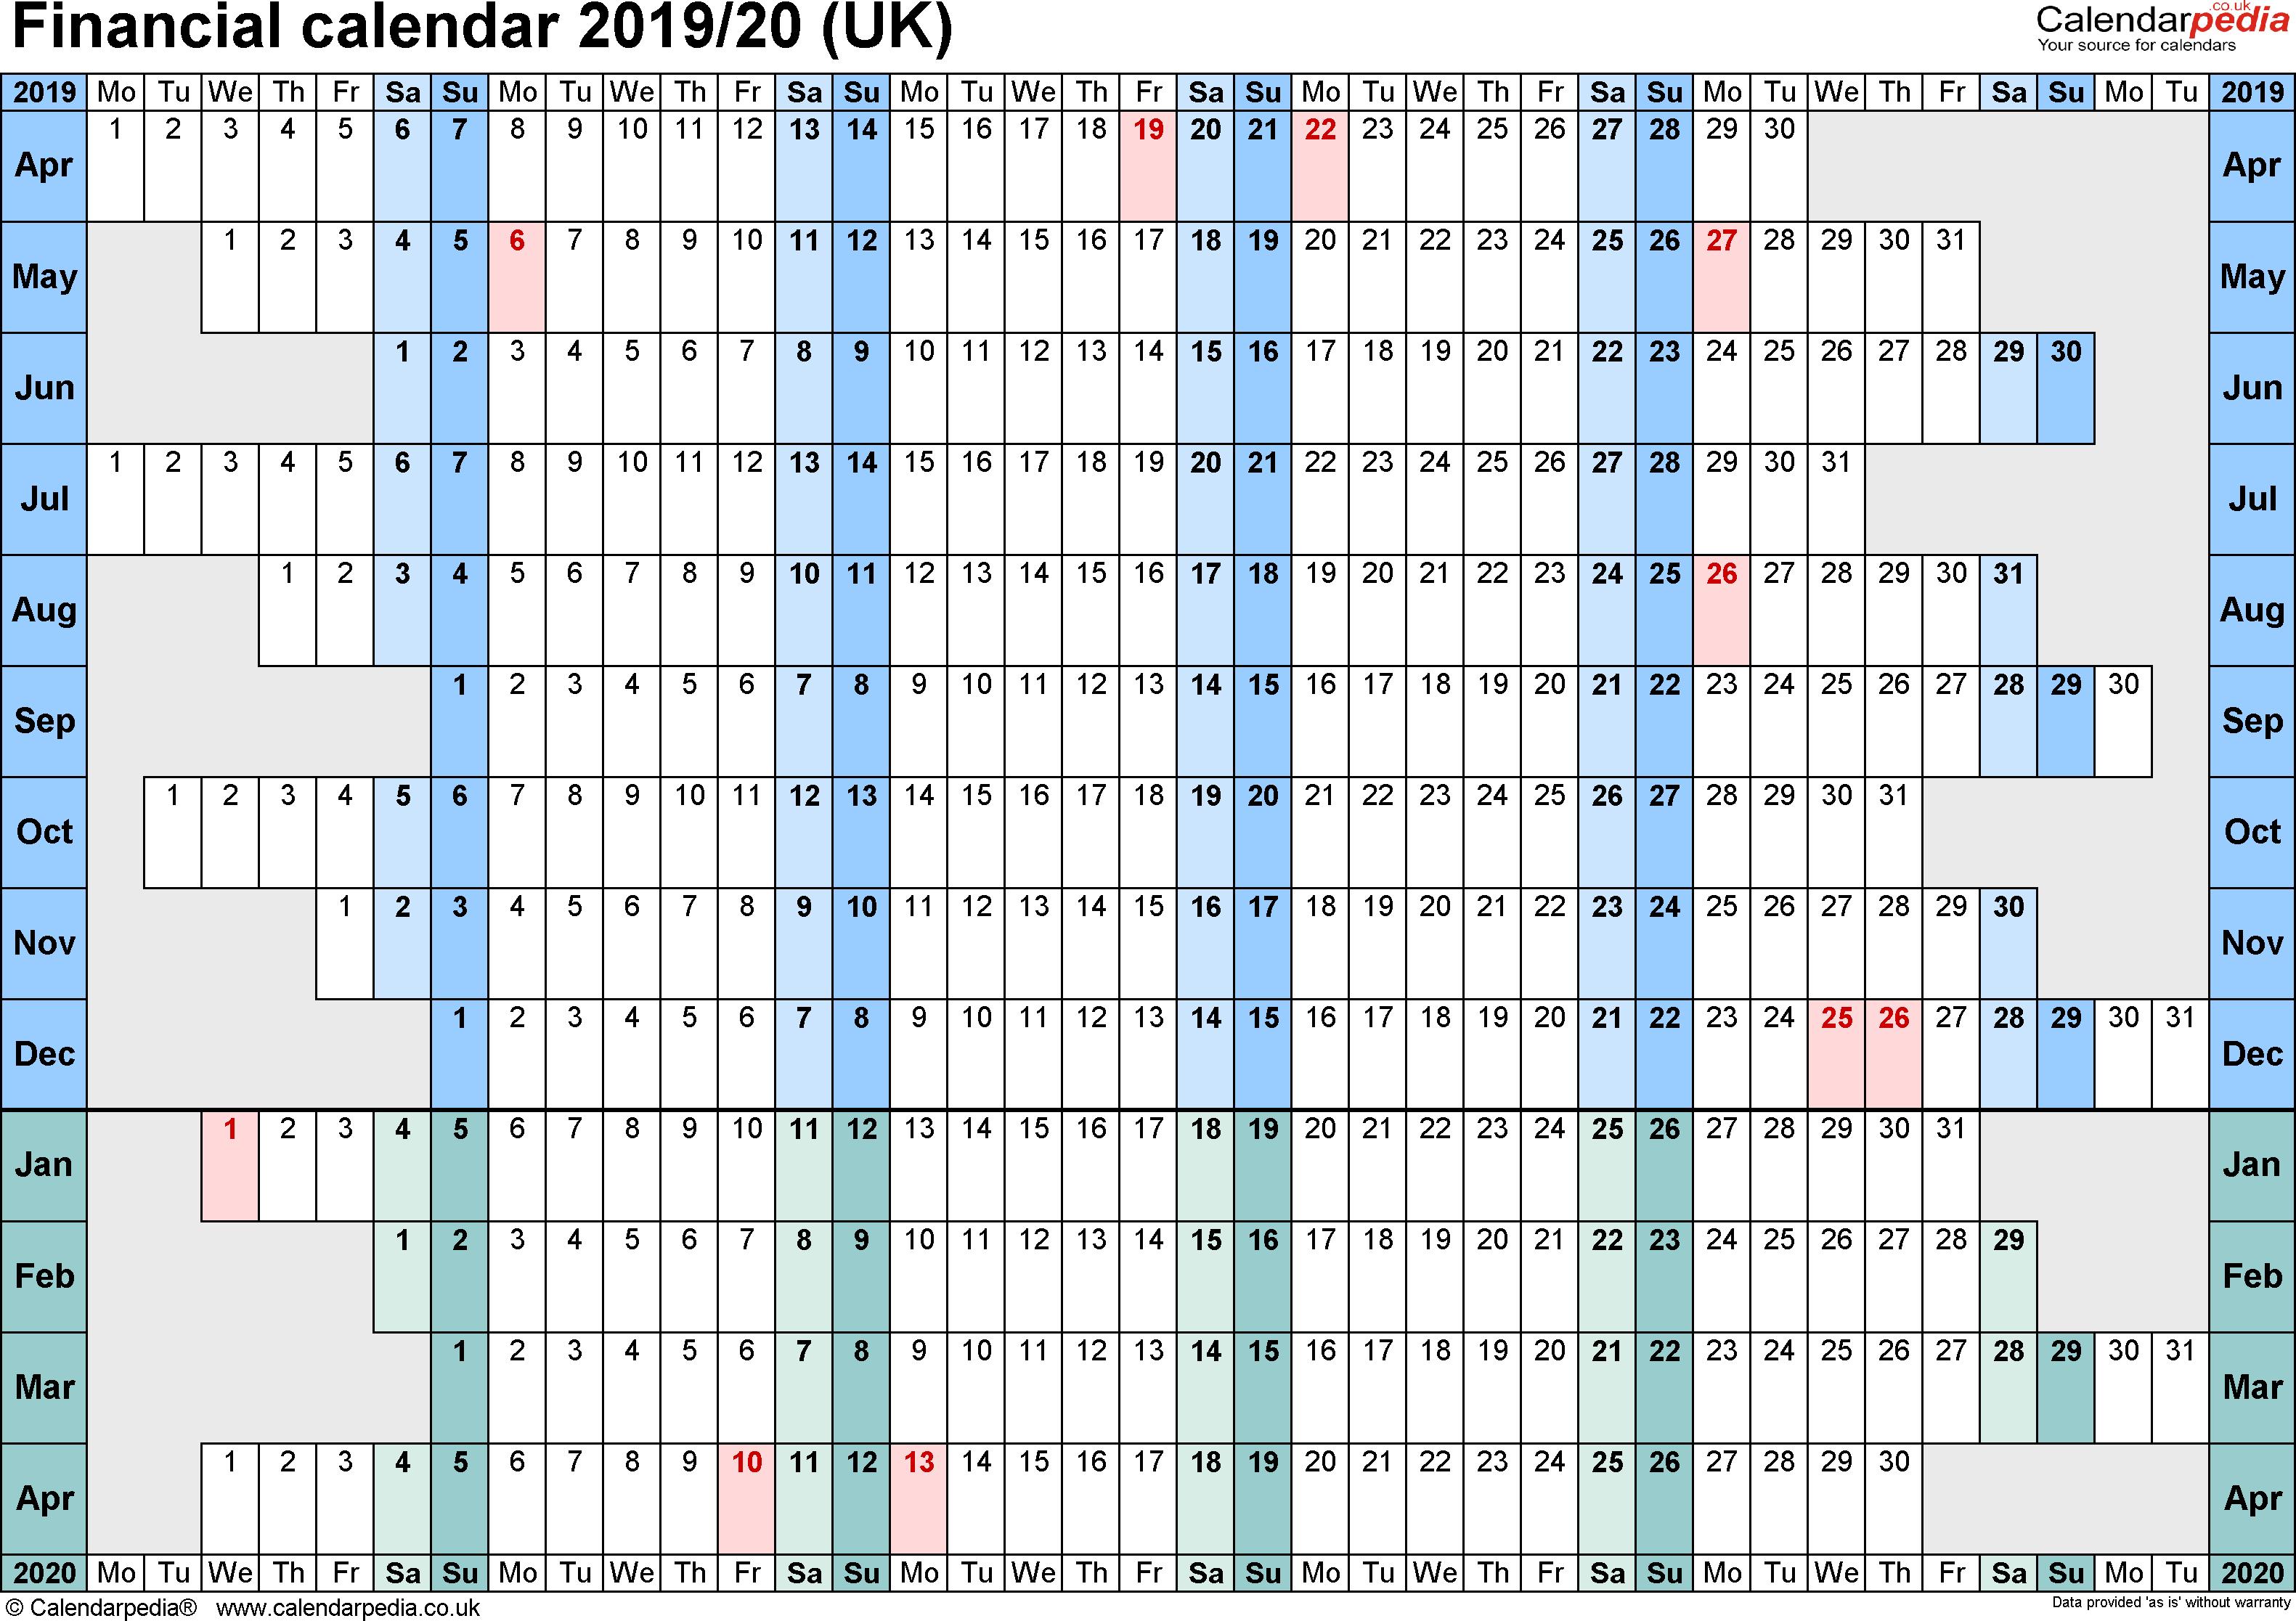 Financial Calendars 2019/20 (Uk) In Pdf Format with regard to Hmrc Tax 2019 - 2020 Calendars